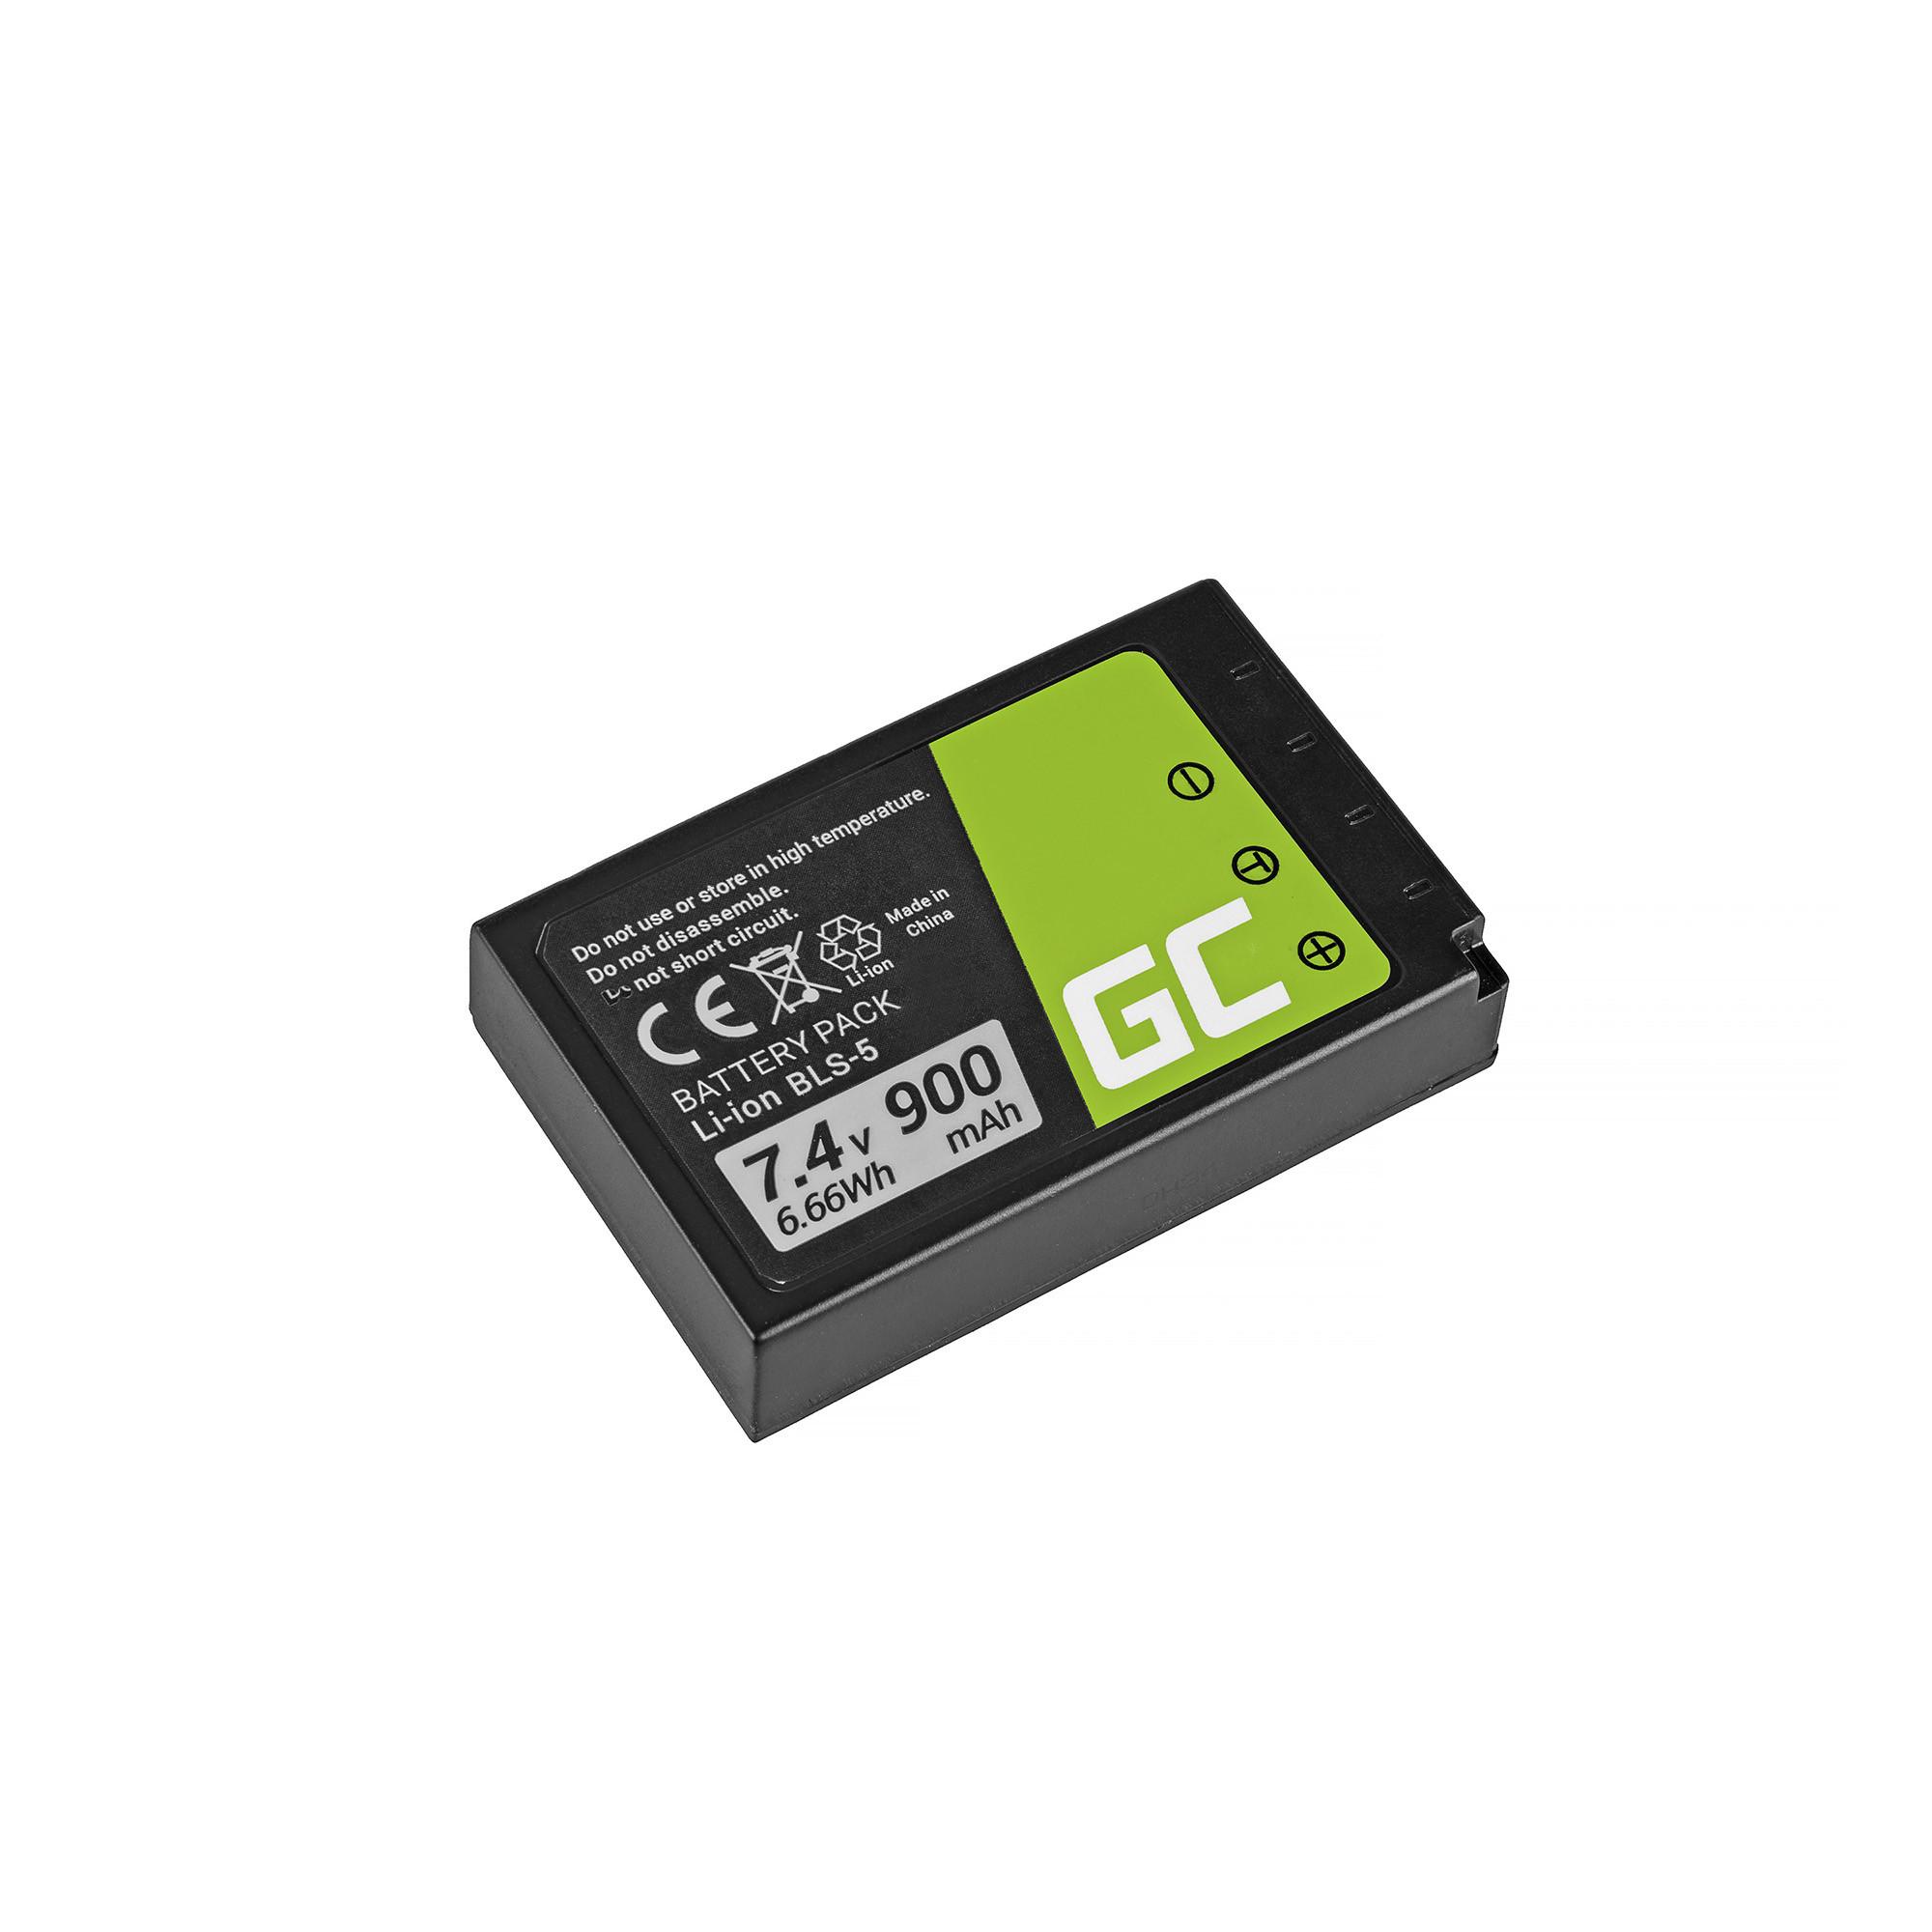 Baterie Green Cell Olympus BLS-5 / BLS-50 Olympus OM-D E-M10, PEN E-PL2, E-PL5, E-PL6, E-PL7, E-PM2 900mAh Li-ion - neoriginální